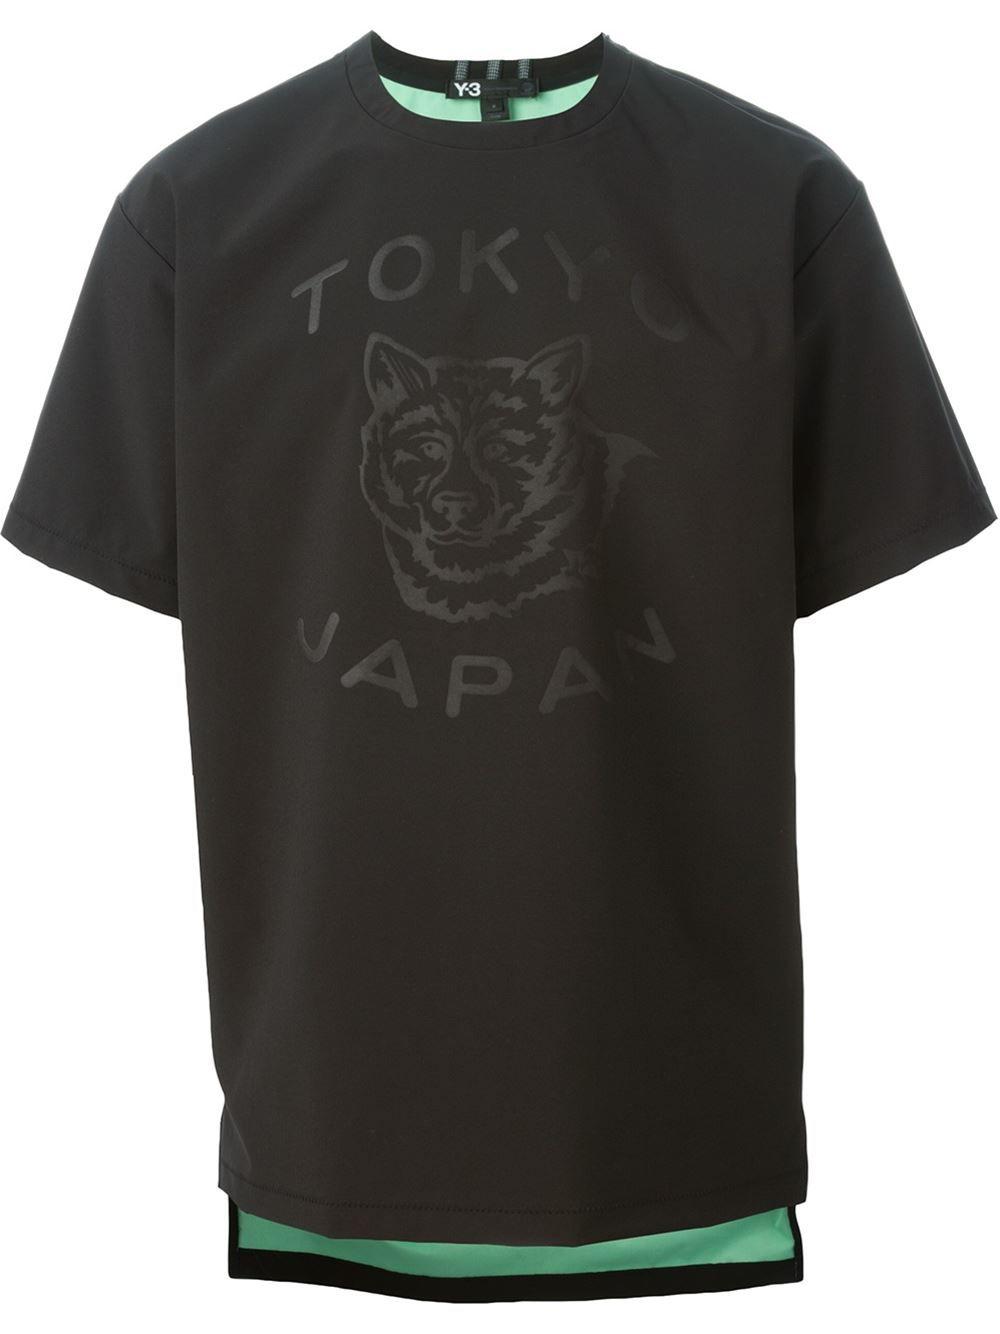 96ad8b0961fc7 Y-3 Tokyo Print T-shirt - Voo Store - Farfetch.com